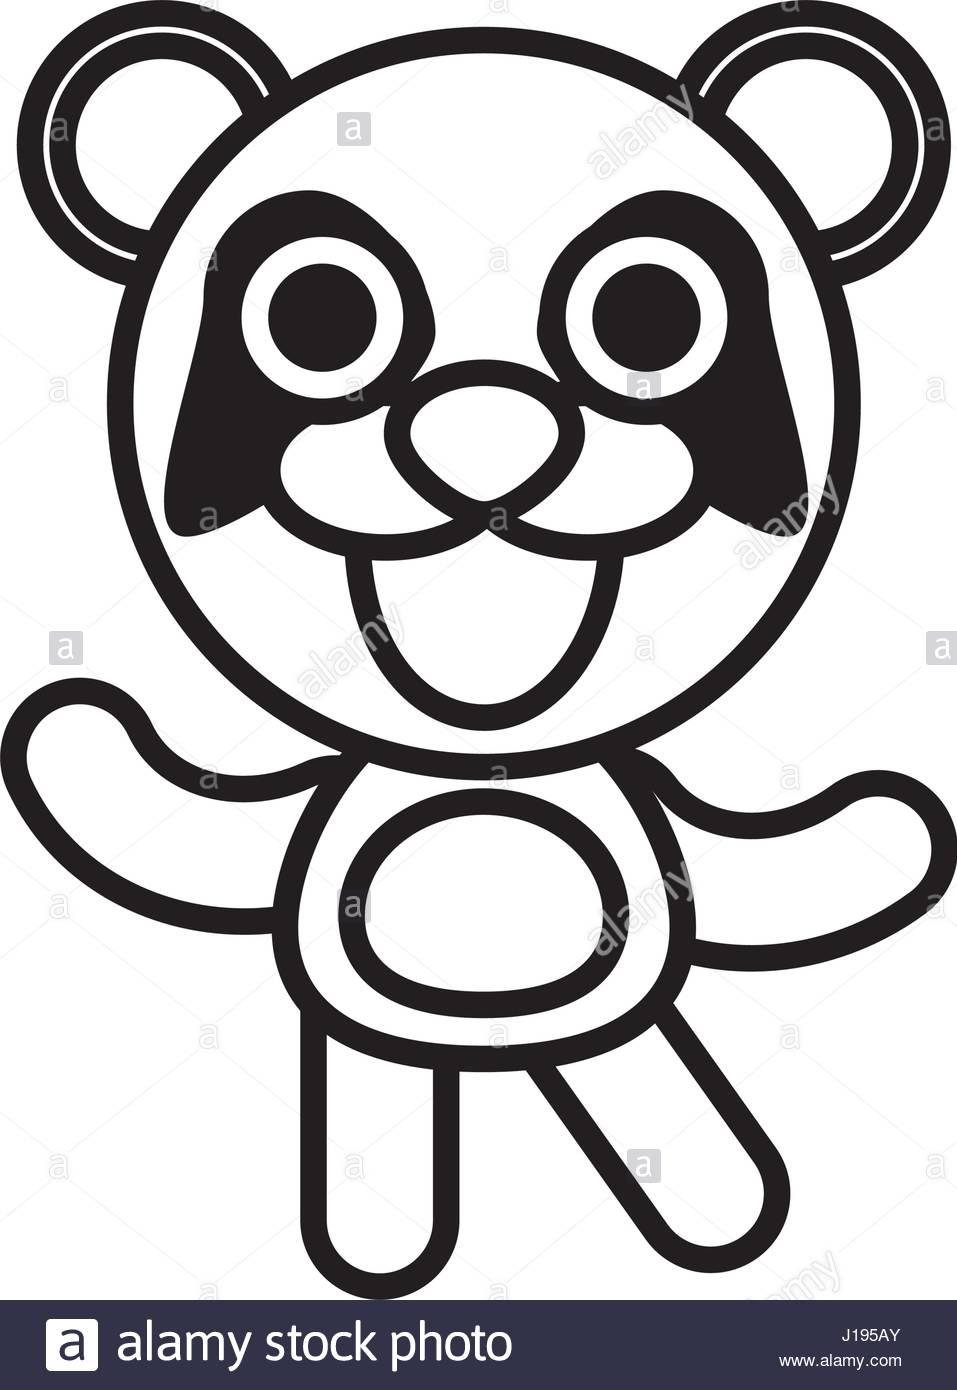 957x1390 Cartoon Panda Animal Outline Stock Vector Art Amp Illustration